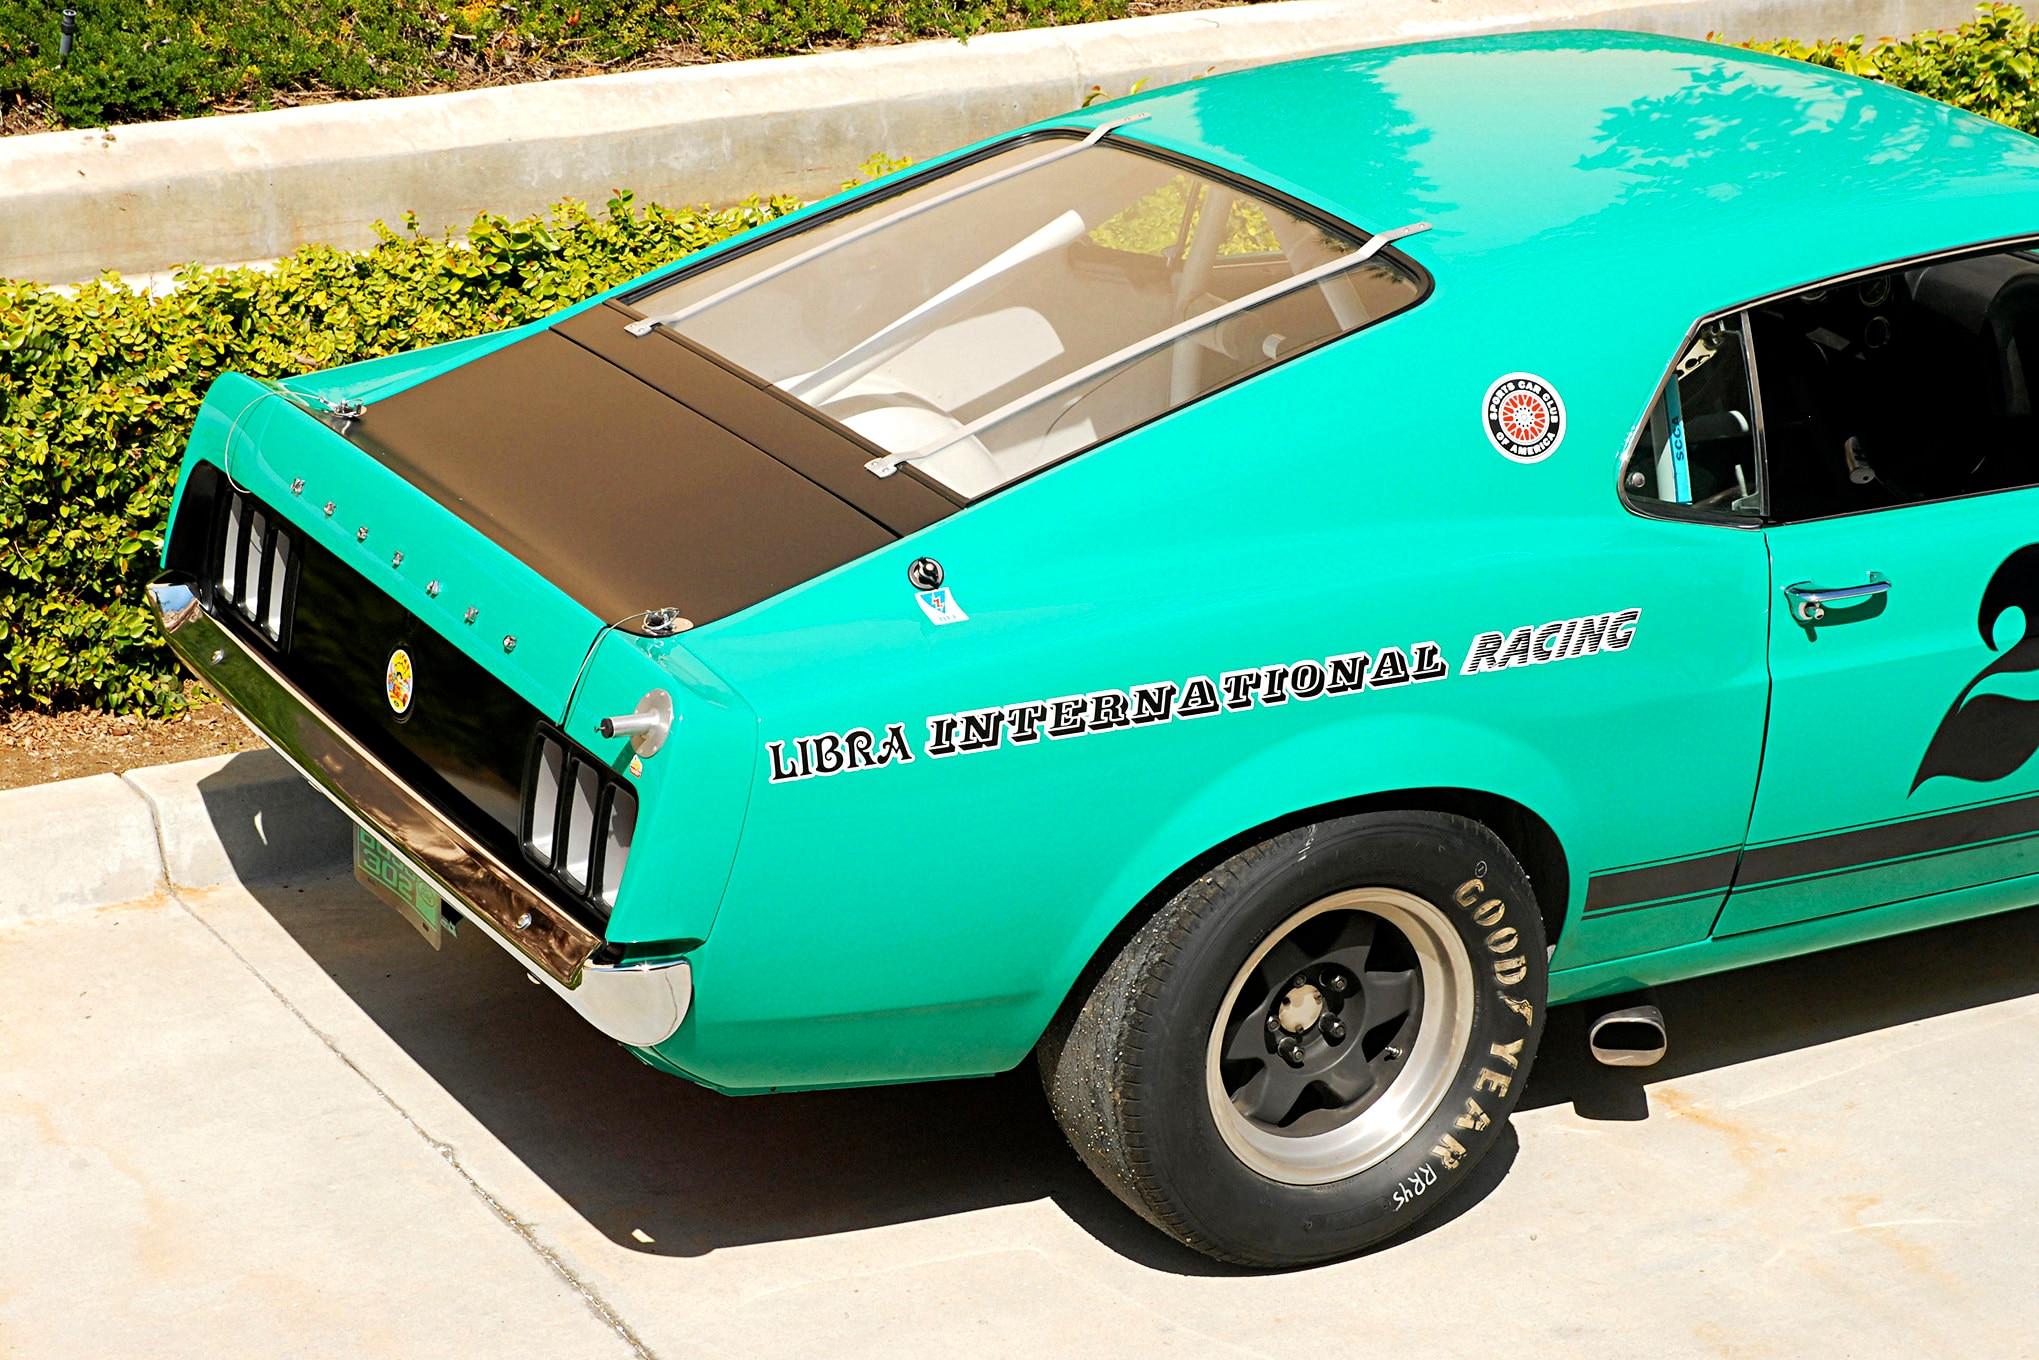 007 Conley 1970 Ford Mustang Boss 302 Rear Detail